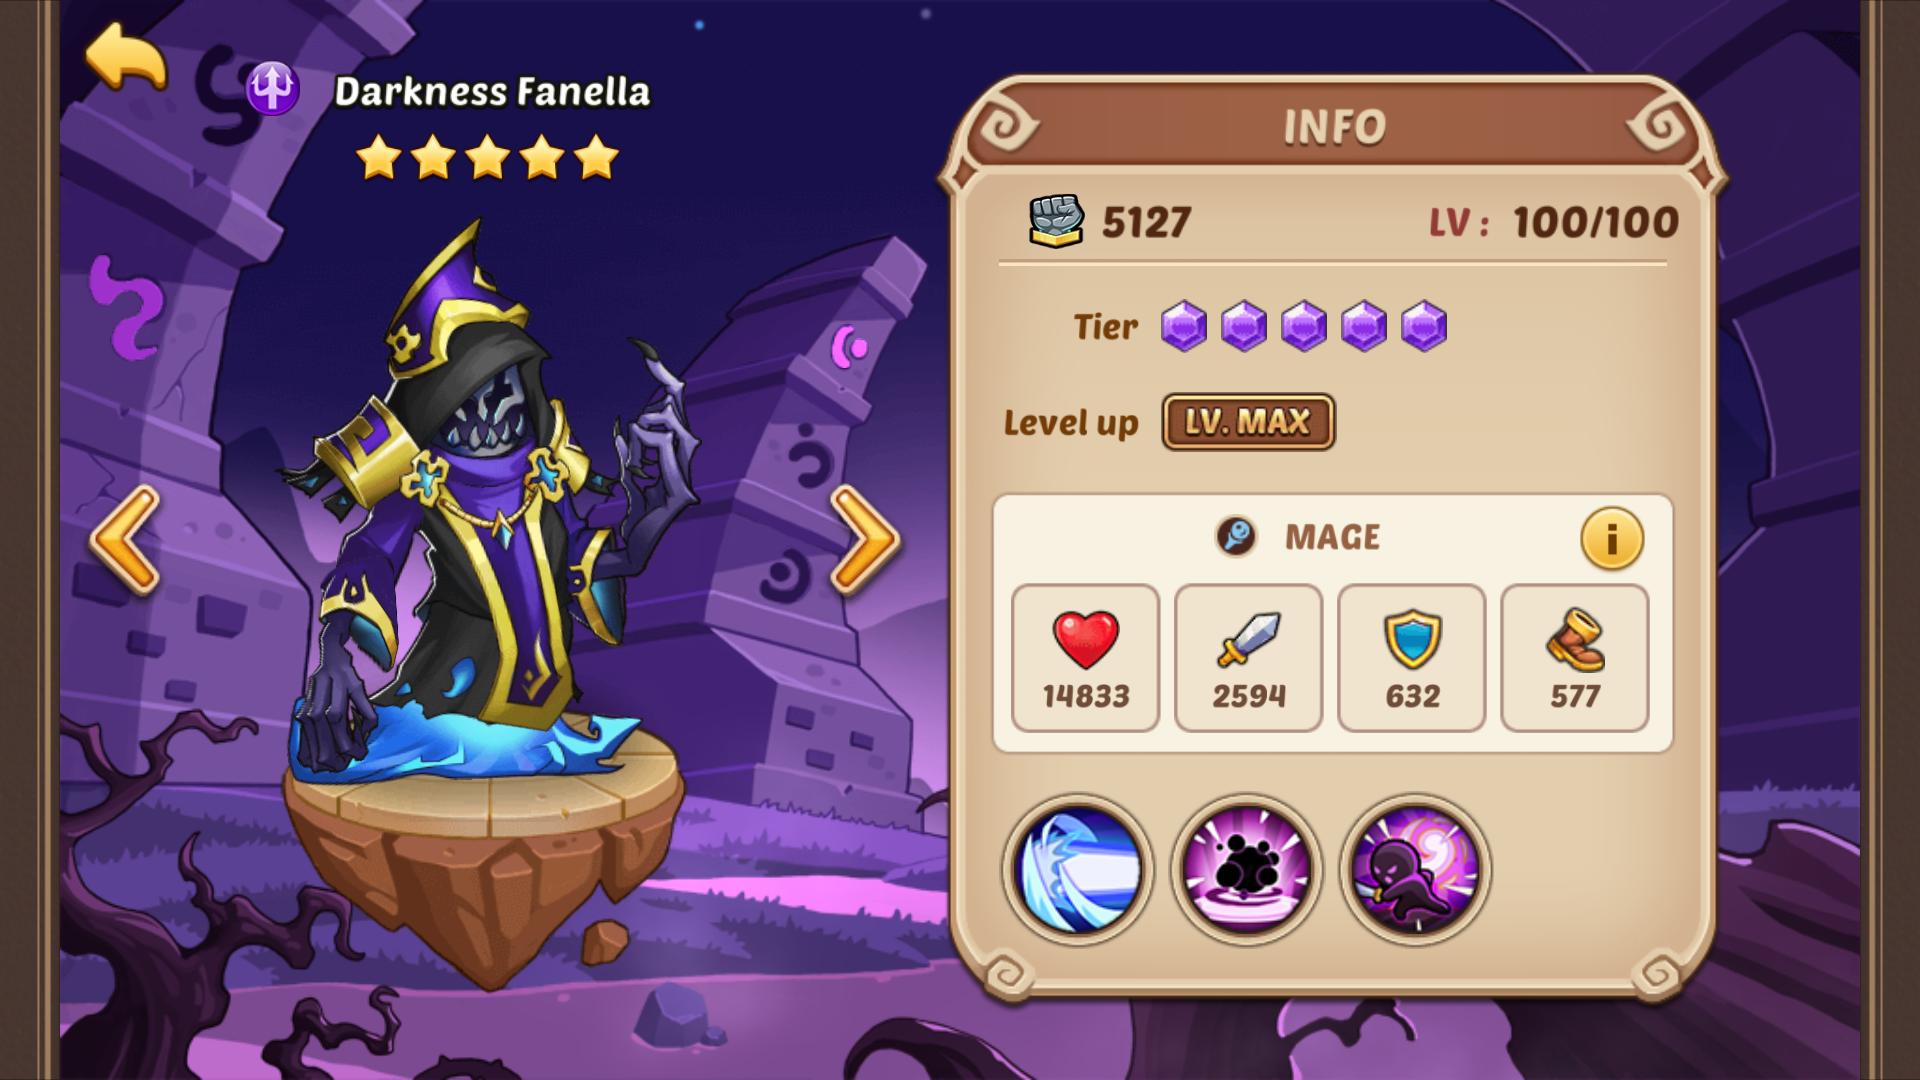 Darkness Fanella